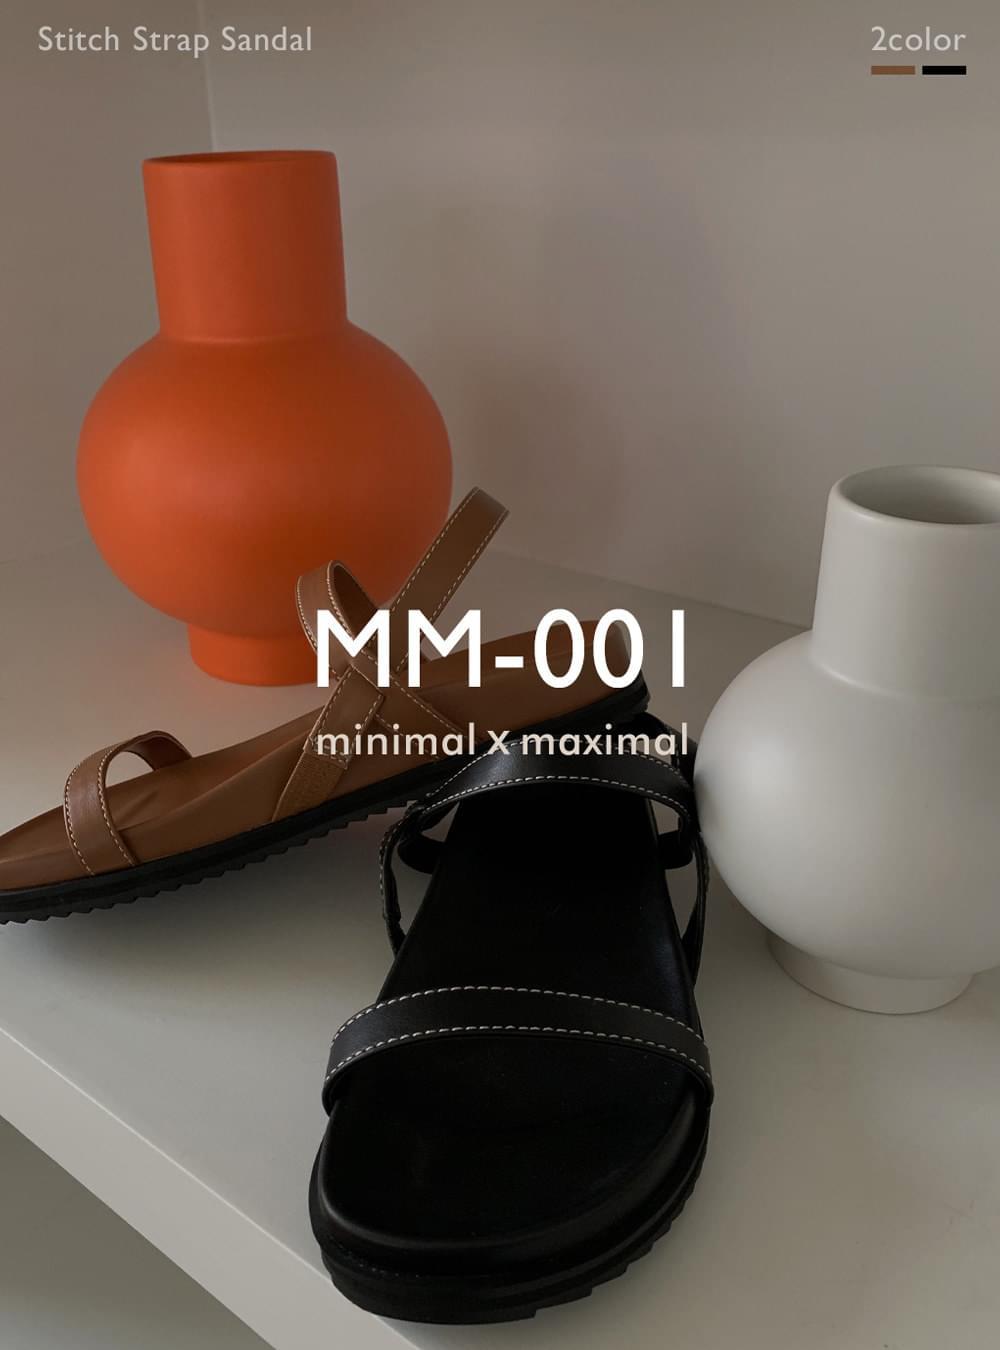 MMMM# single order/same-day shipping MM-001 stitch strap sandals